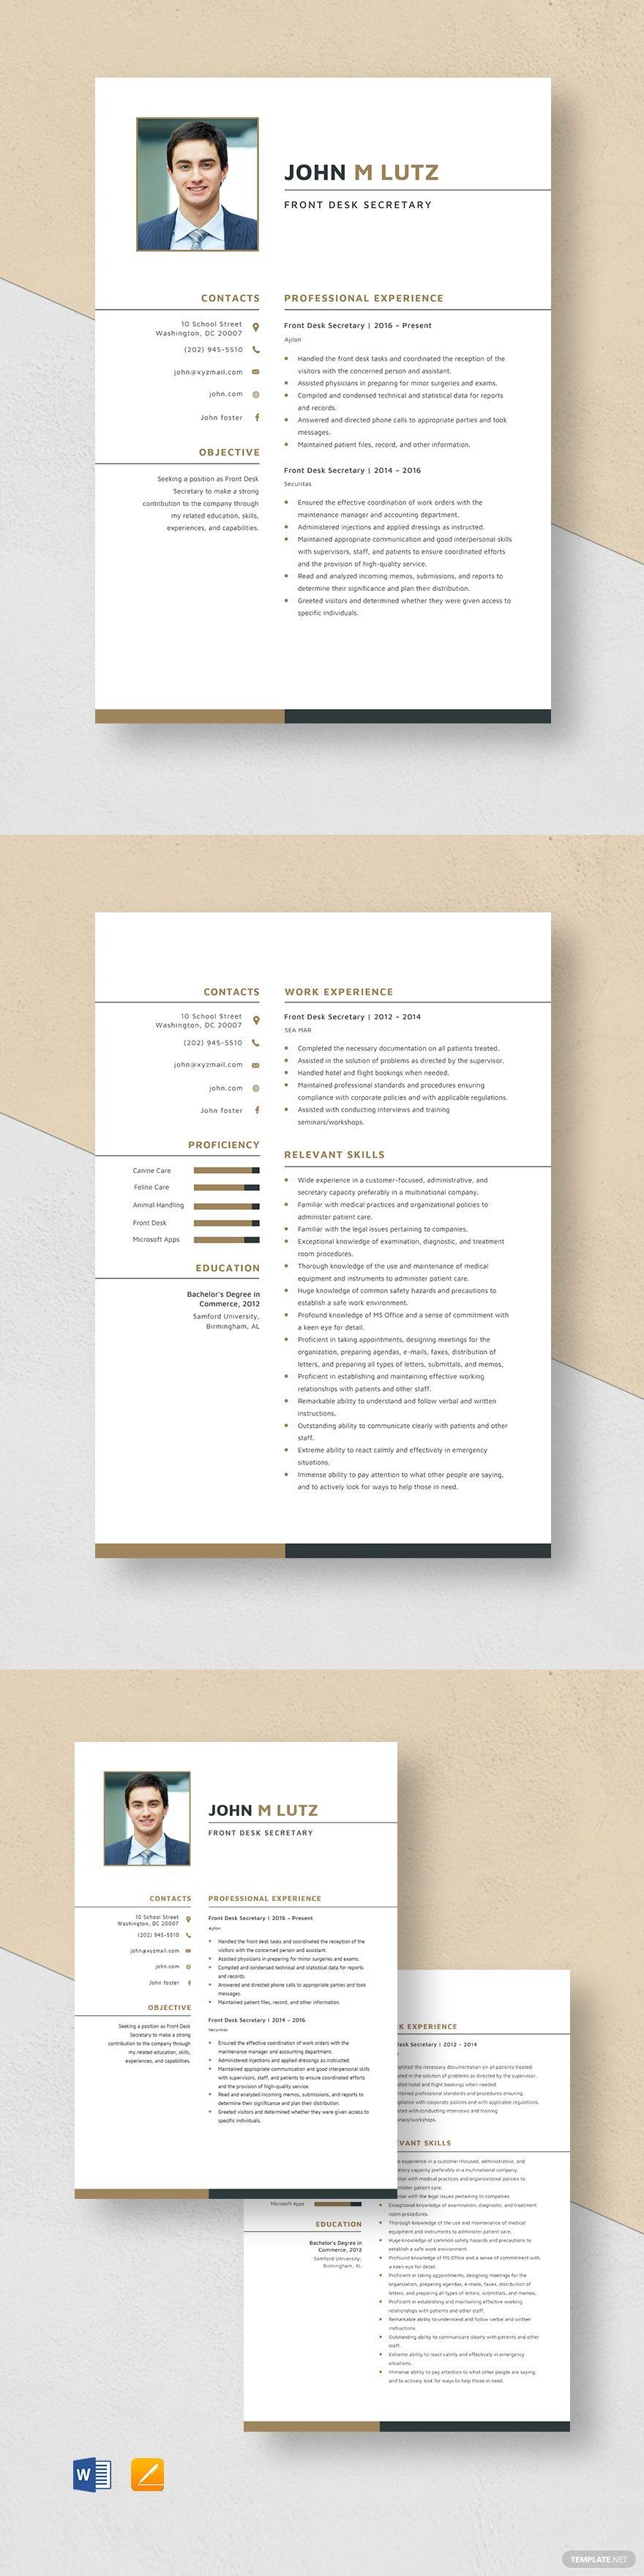 Front Desk Secretary Resume Template in 2020 Graphic